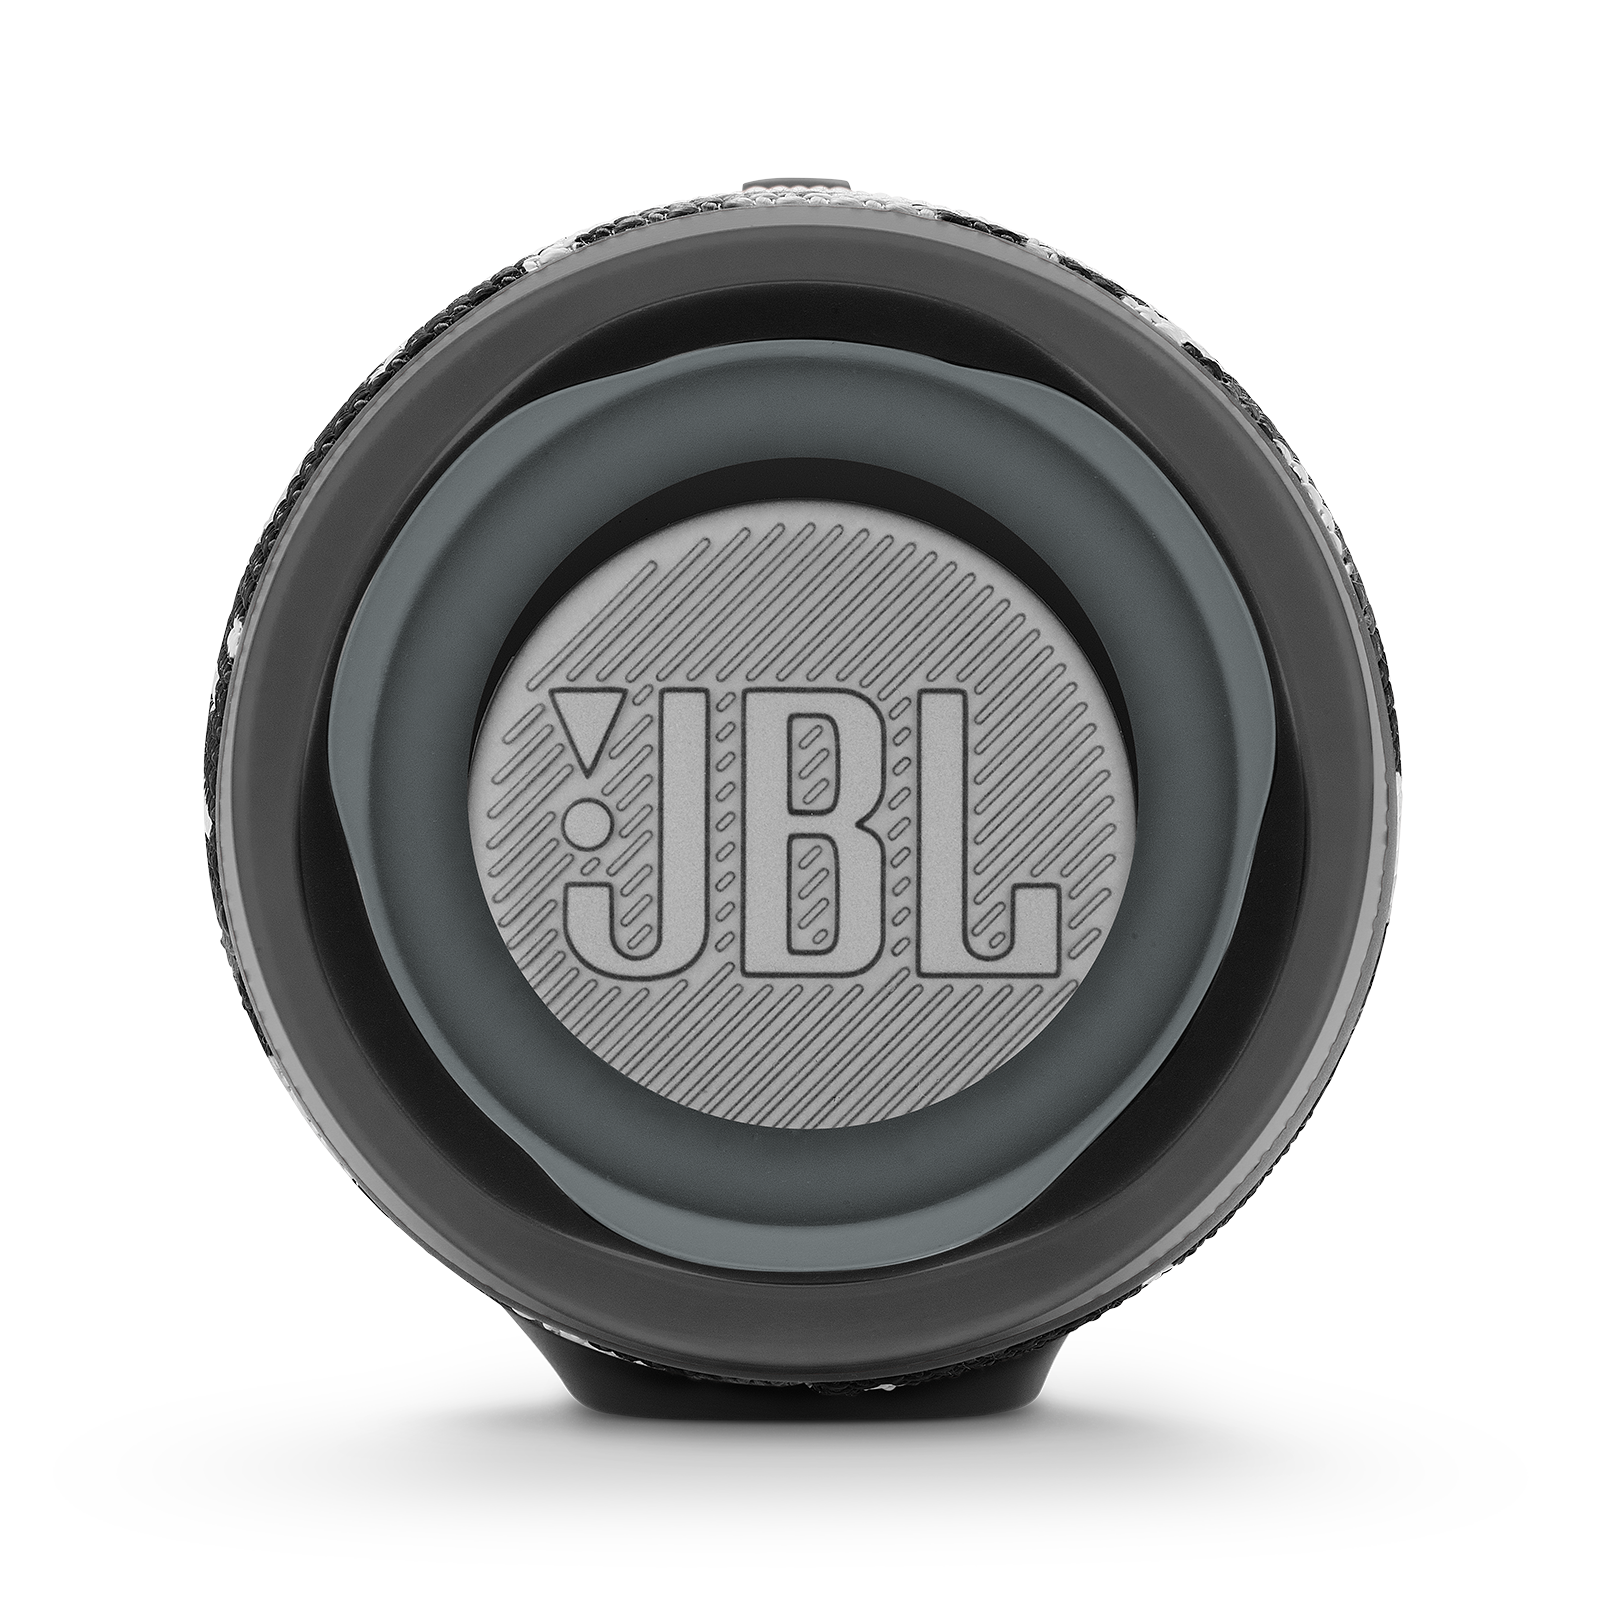 JBL Charge 4 - Black/White Camouflage - Portable Bluetooth speaker - Detailshot 2